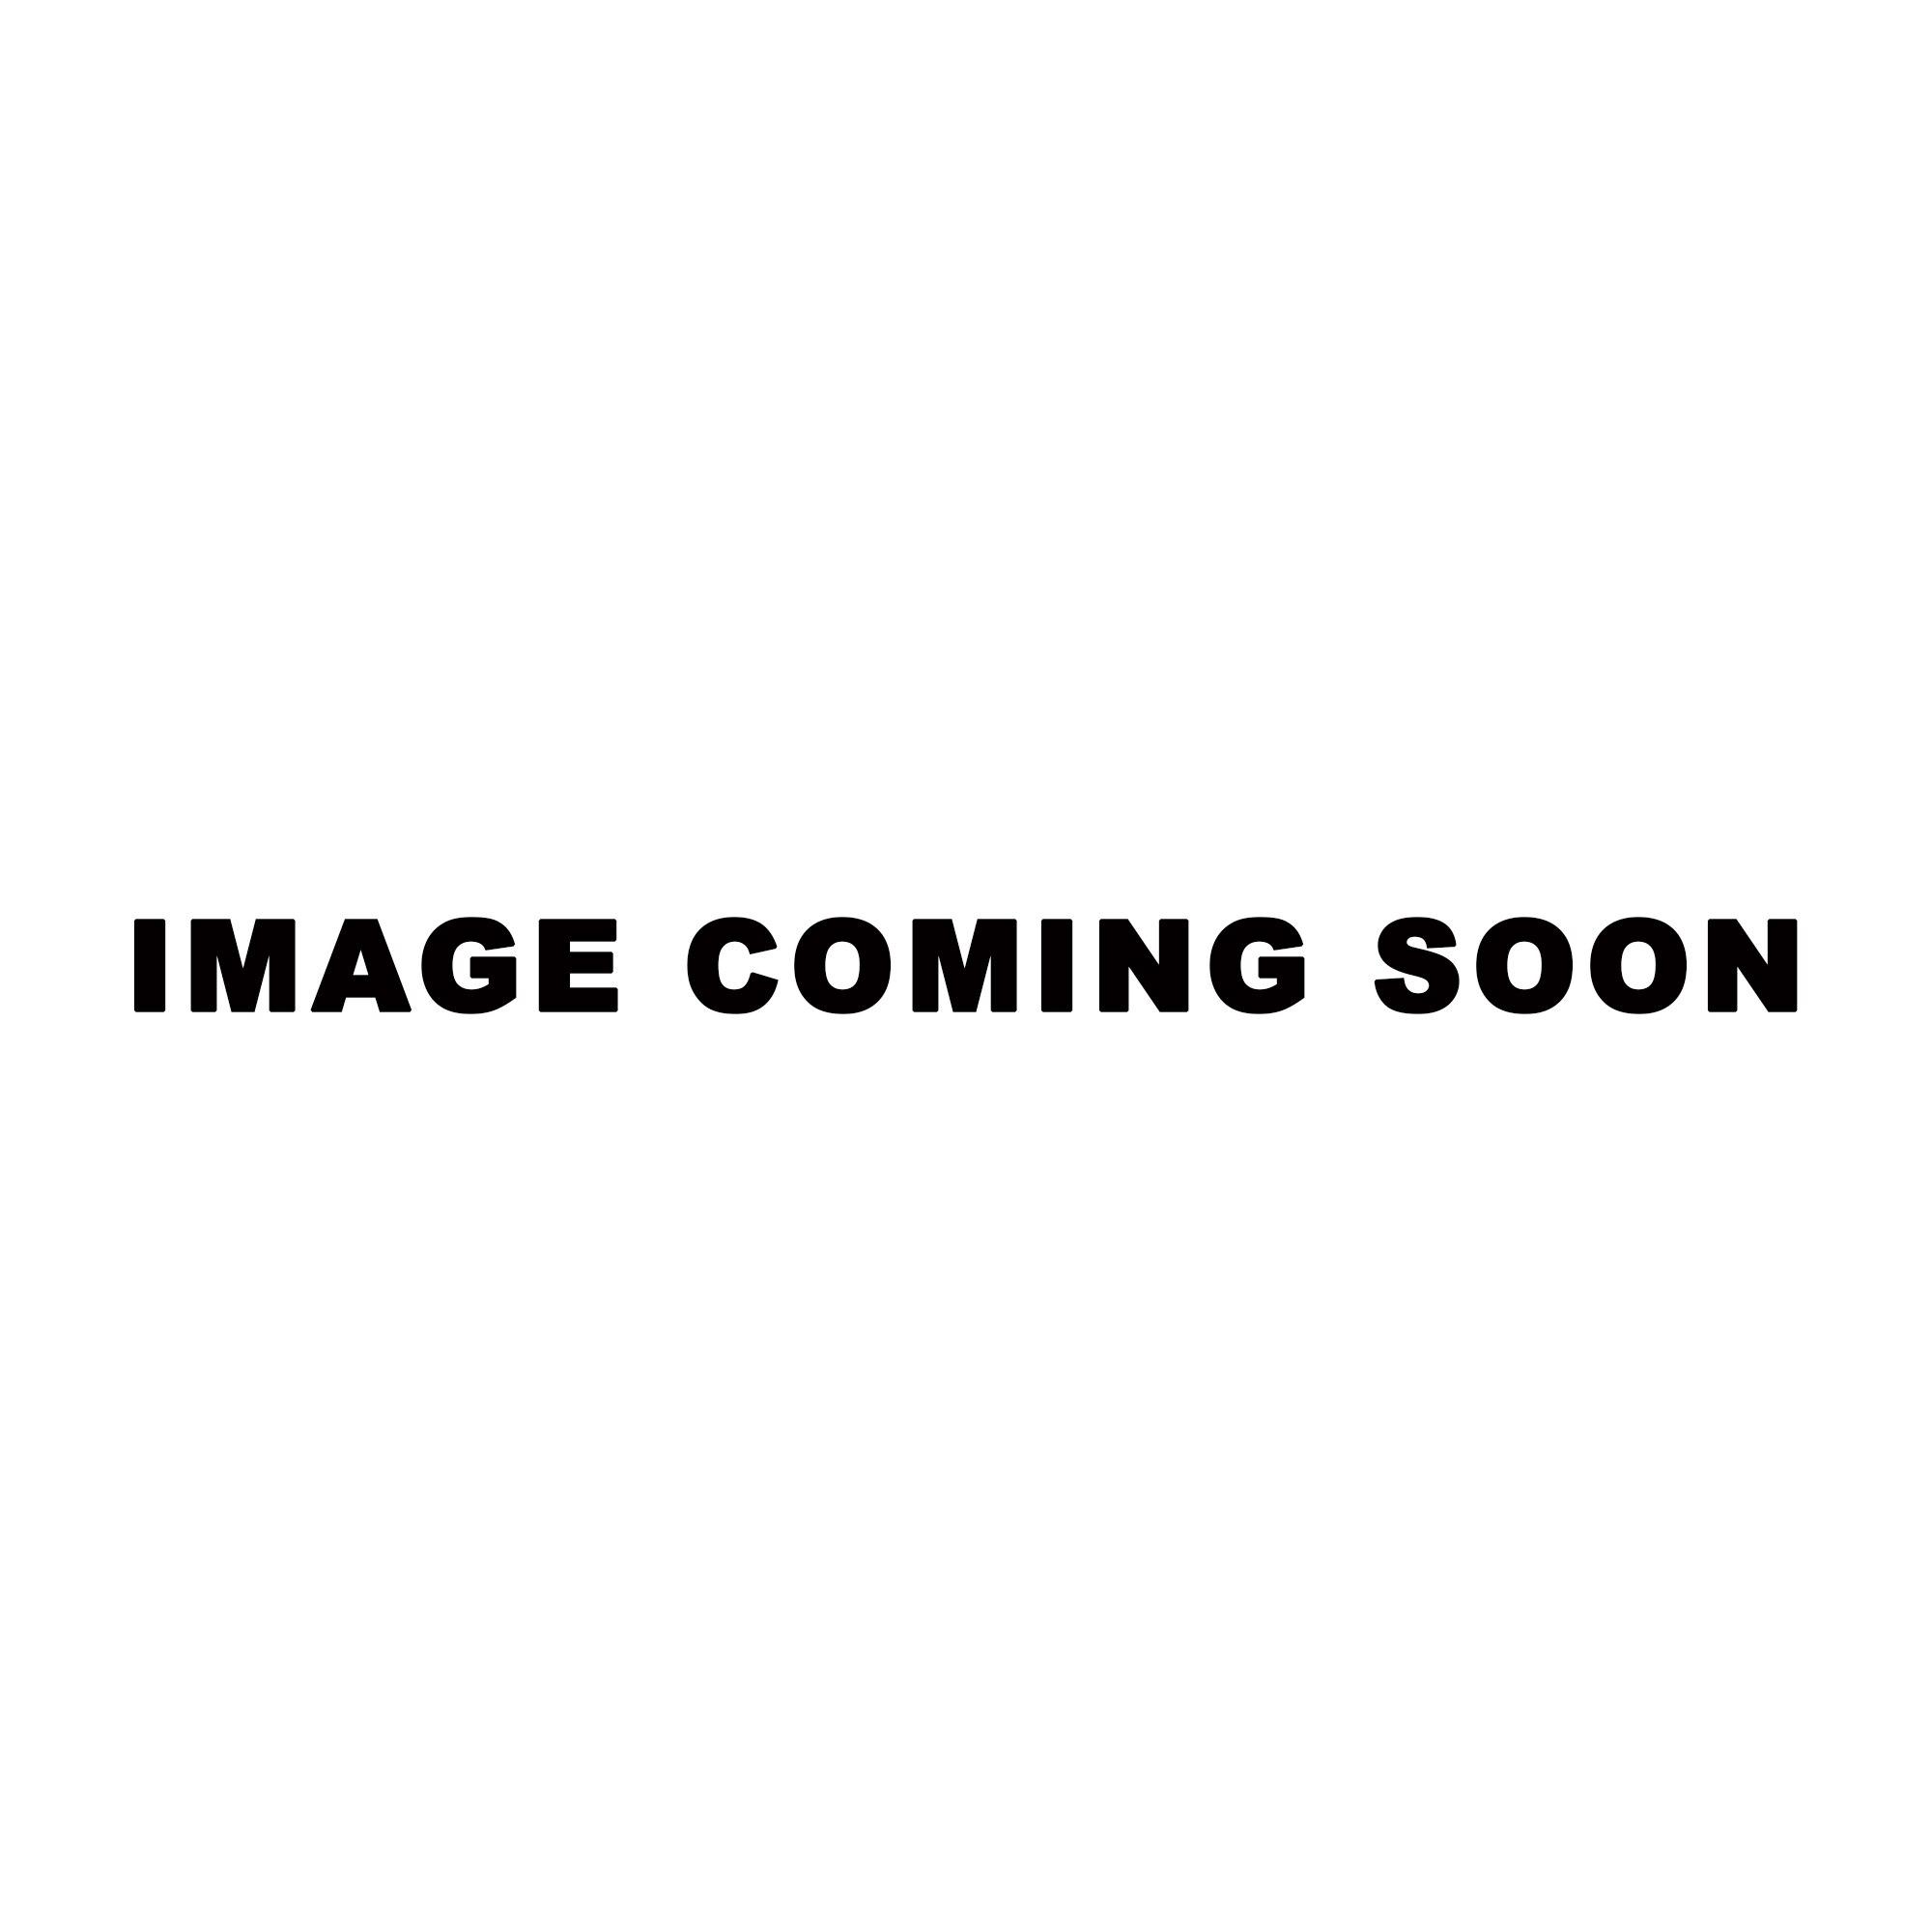 Nike Florida Gators Infant Football Jersey Long Sleeve